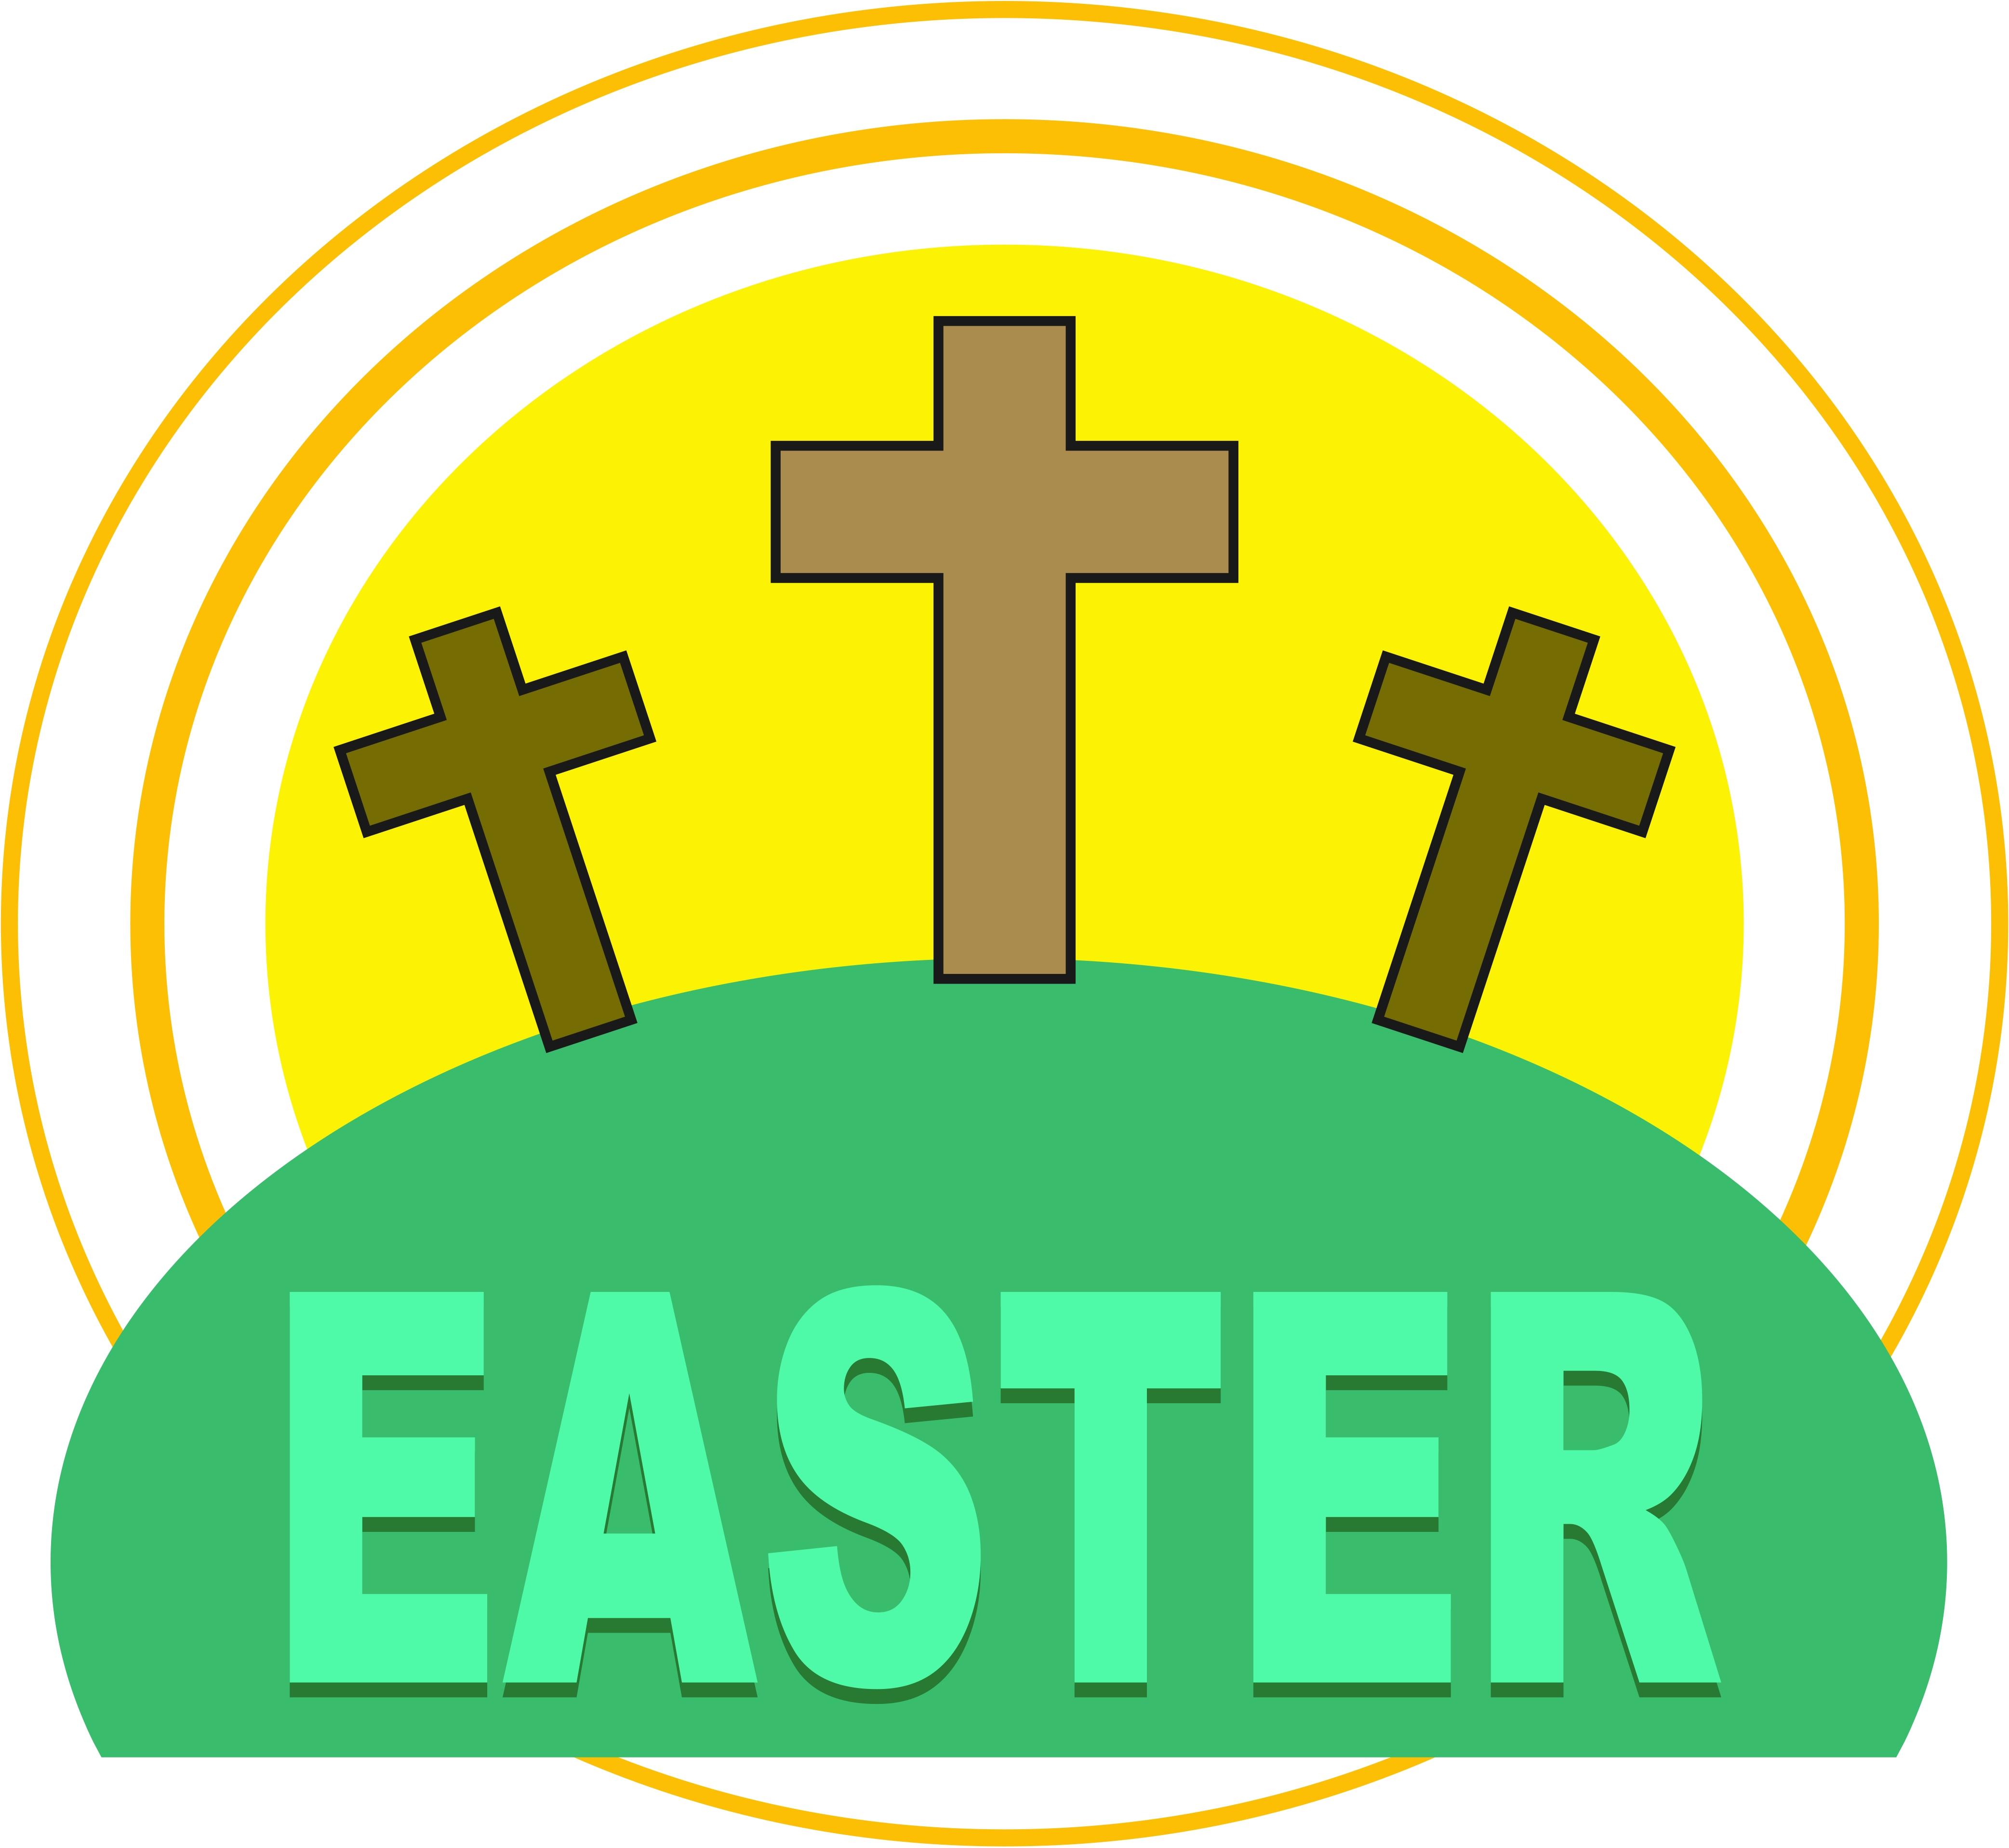 Grave clipart easter Art Church Online Download Clip